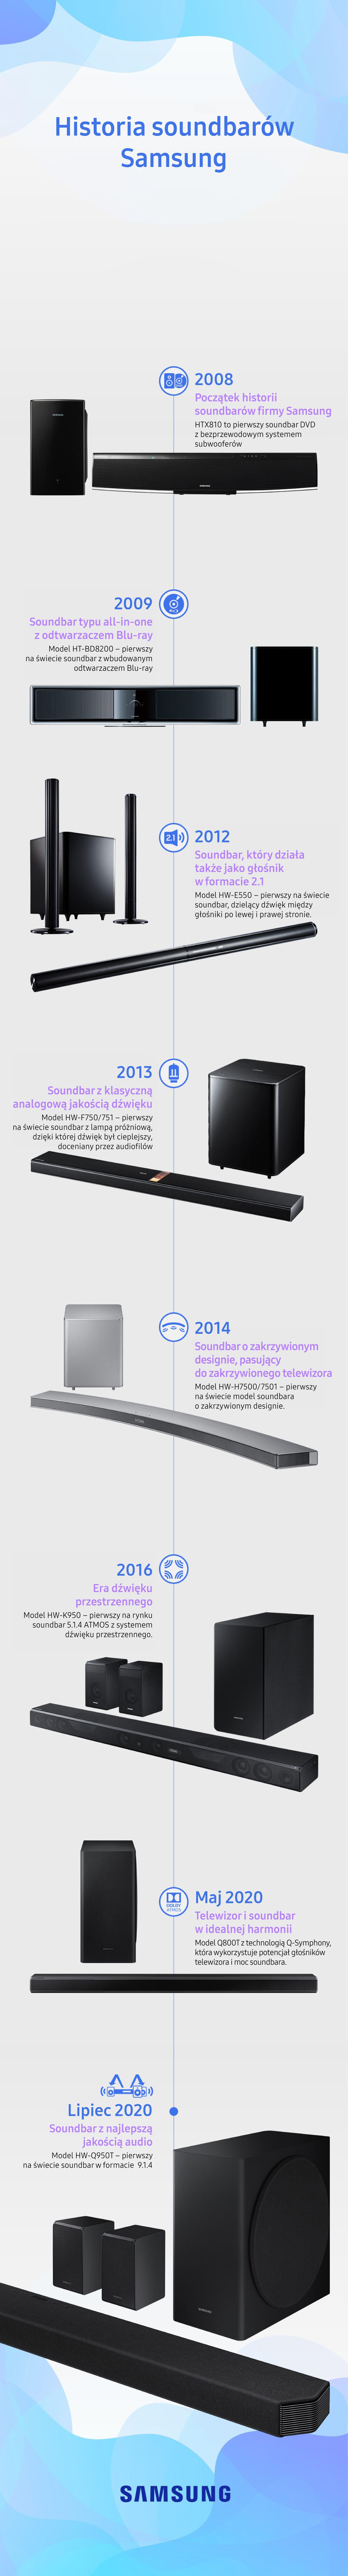 Infographic_History-of-Samsung-Soundbars_0902_PL